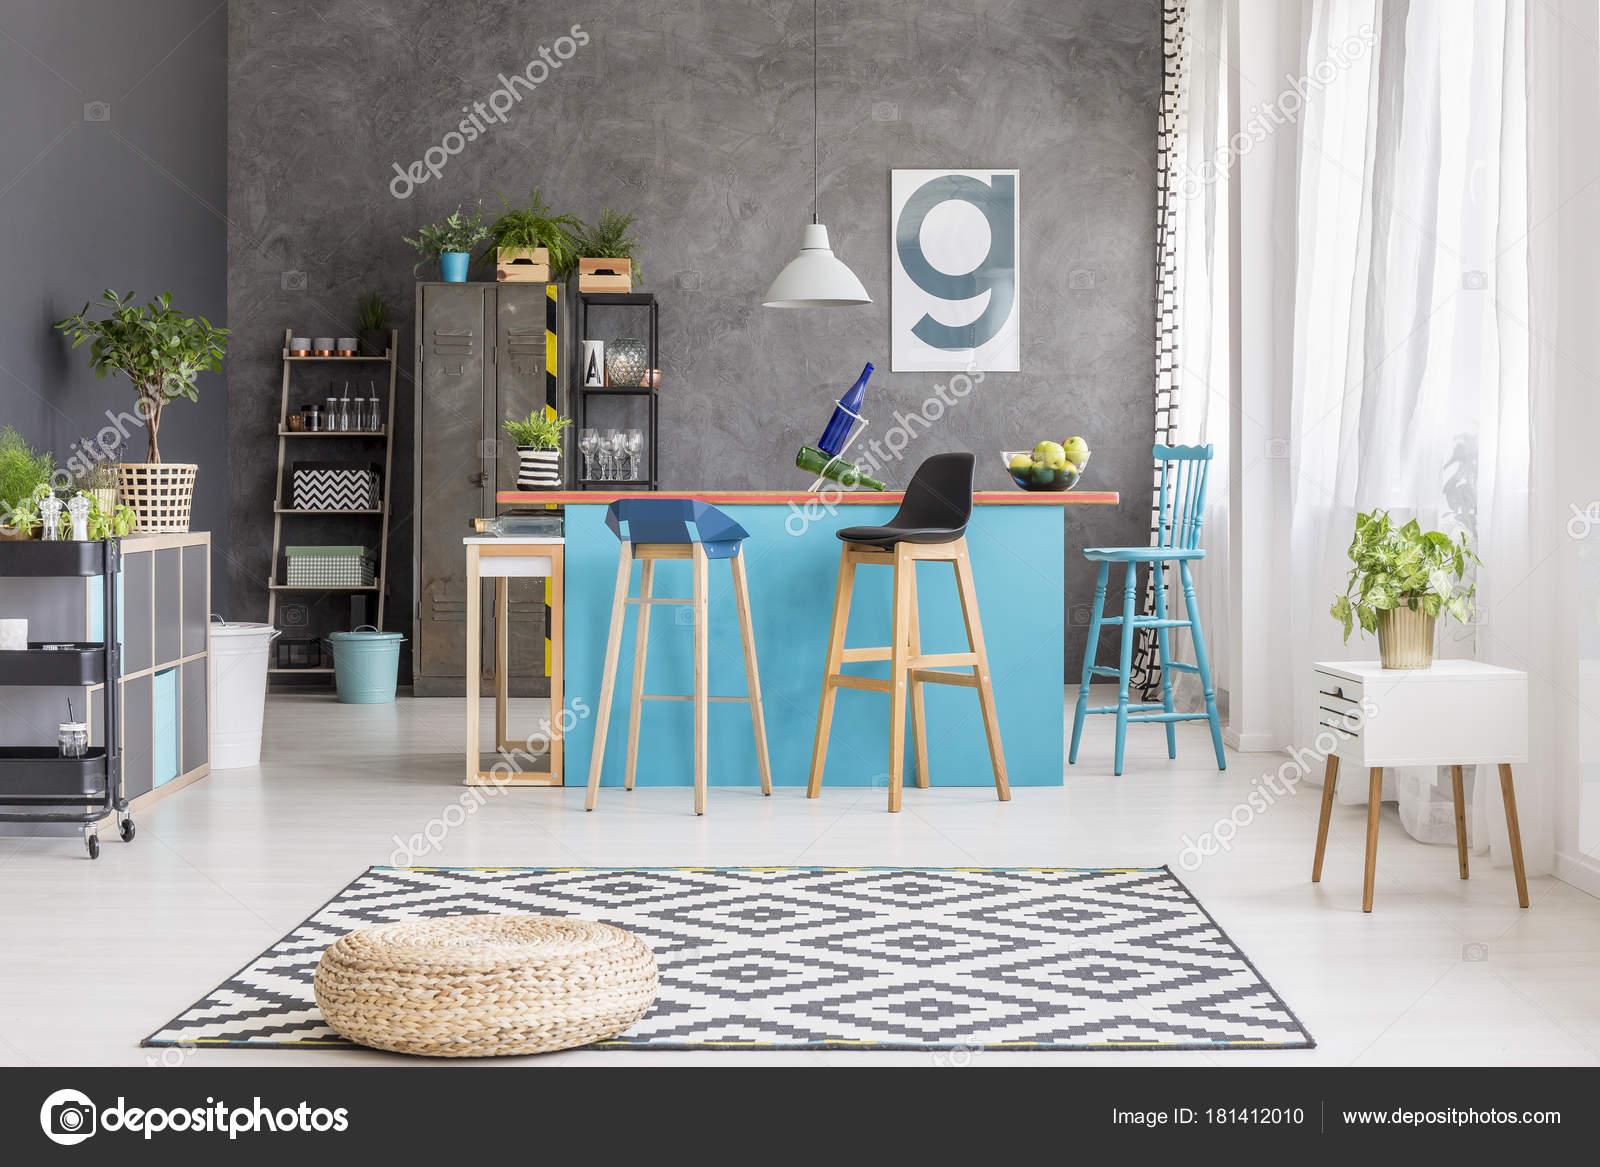 black kitchen rugs moen hands free faucet 几何地毯上的凳 图库照片 c photographee eu 181412010 藤凳在黑色和白色地毯与几何样式说谎在一个蓝色厨房海岛前面在饭厅内部 照片作者photographee